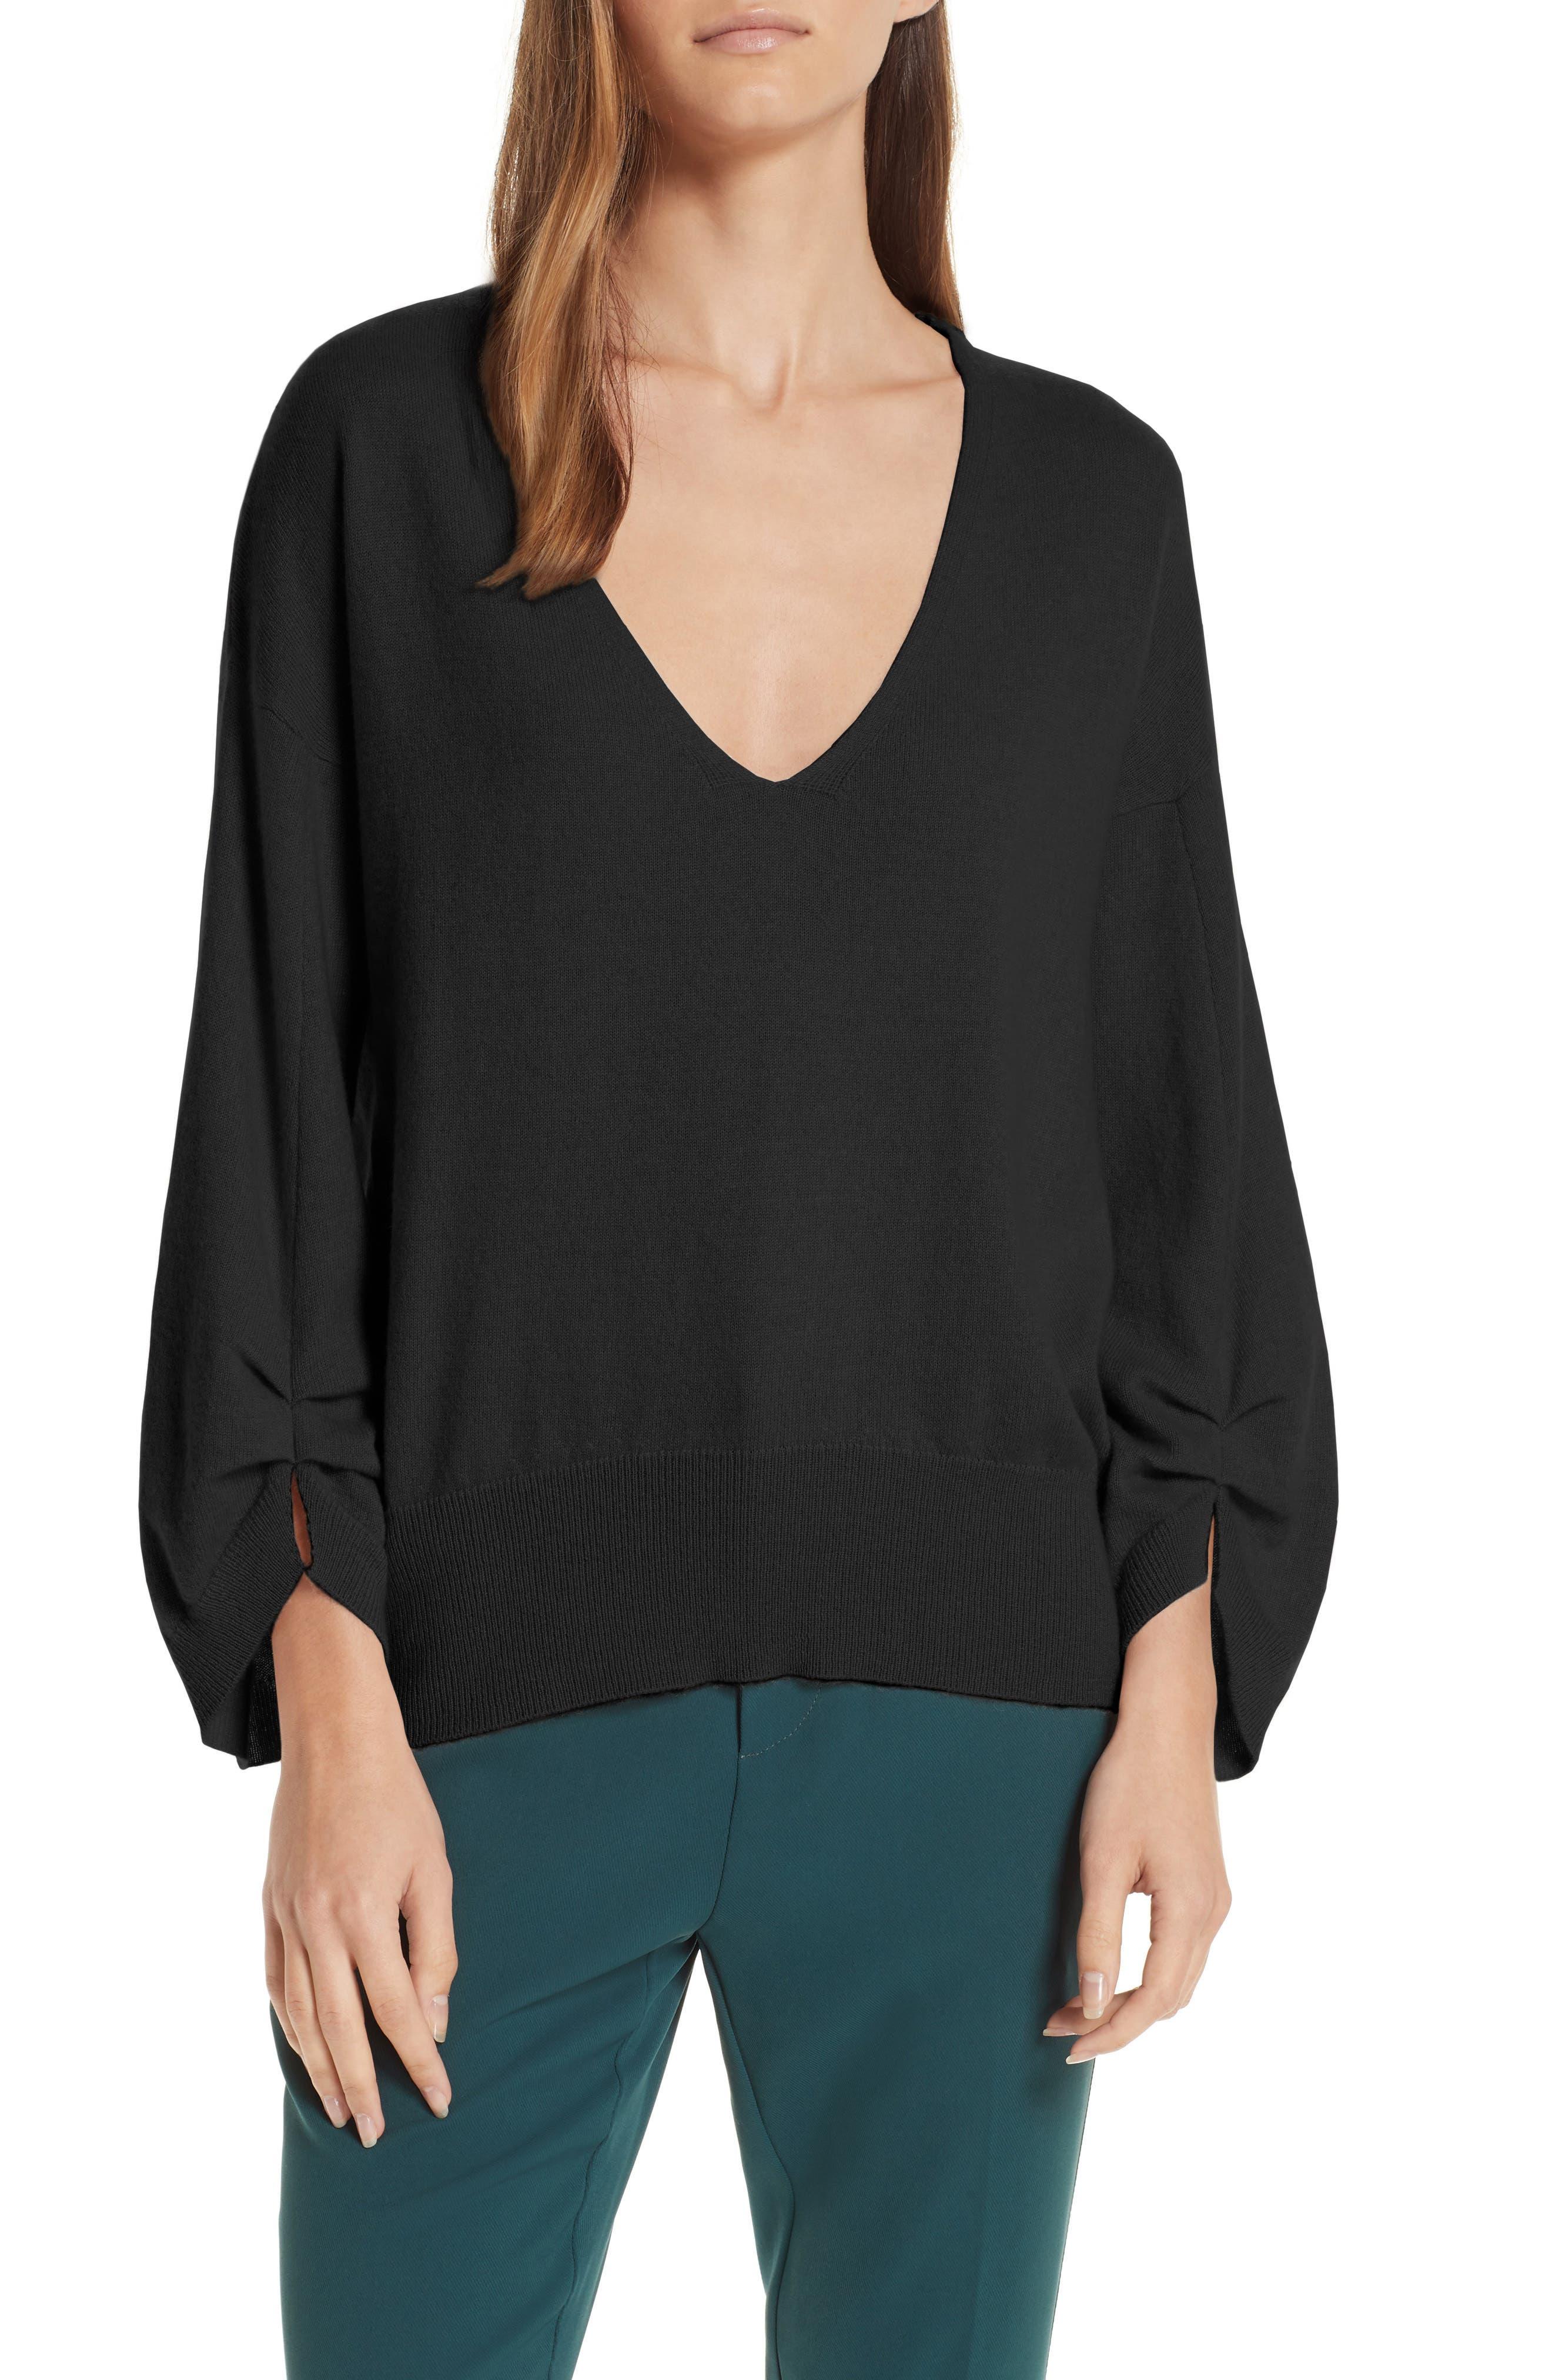 Brochu Walker Casimir Cashmere Pullover Sweater, Black